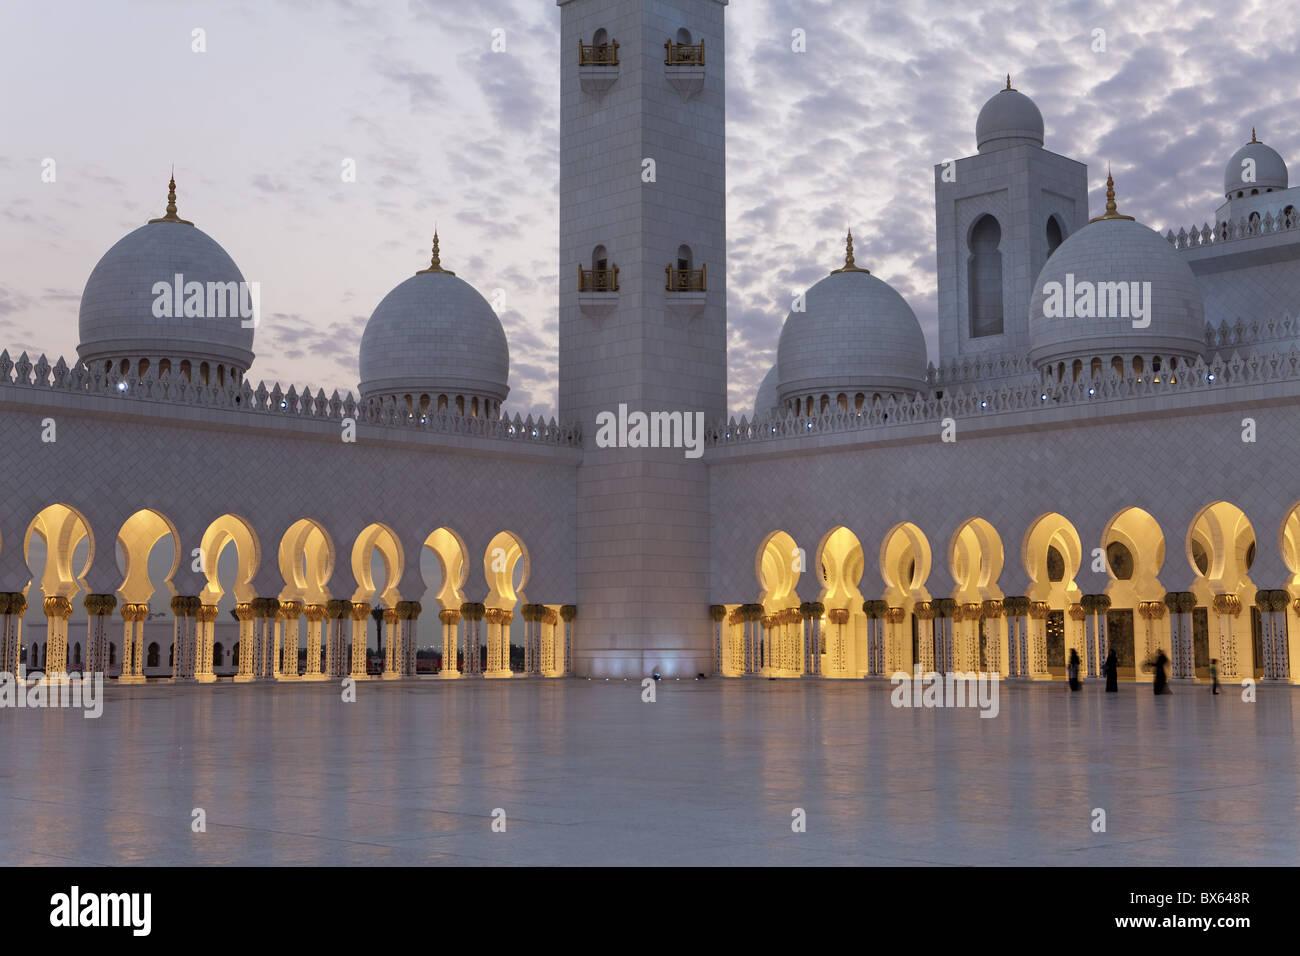 Sheikh Zayed Bin Sultan Al Nahyan moschea, Abu Dhabi, Emirati Arabi Uniti, Medio Oriente Immagini Stock